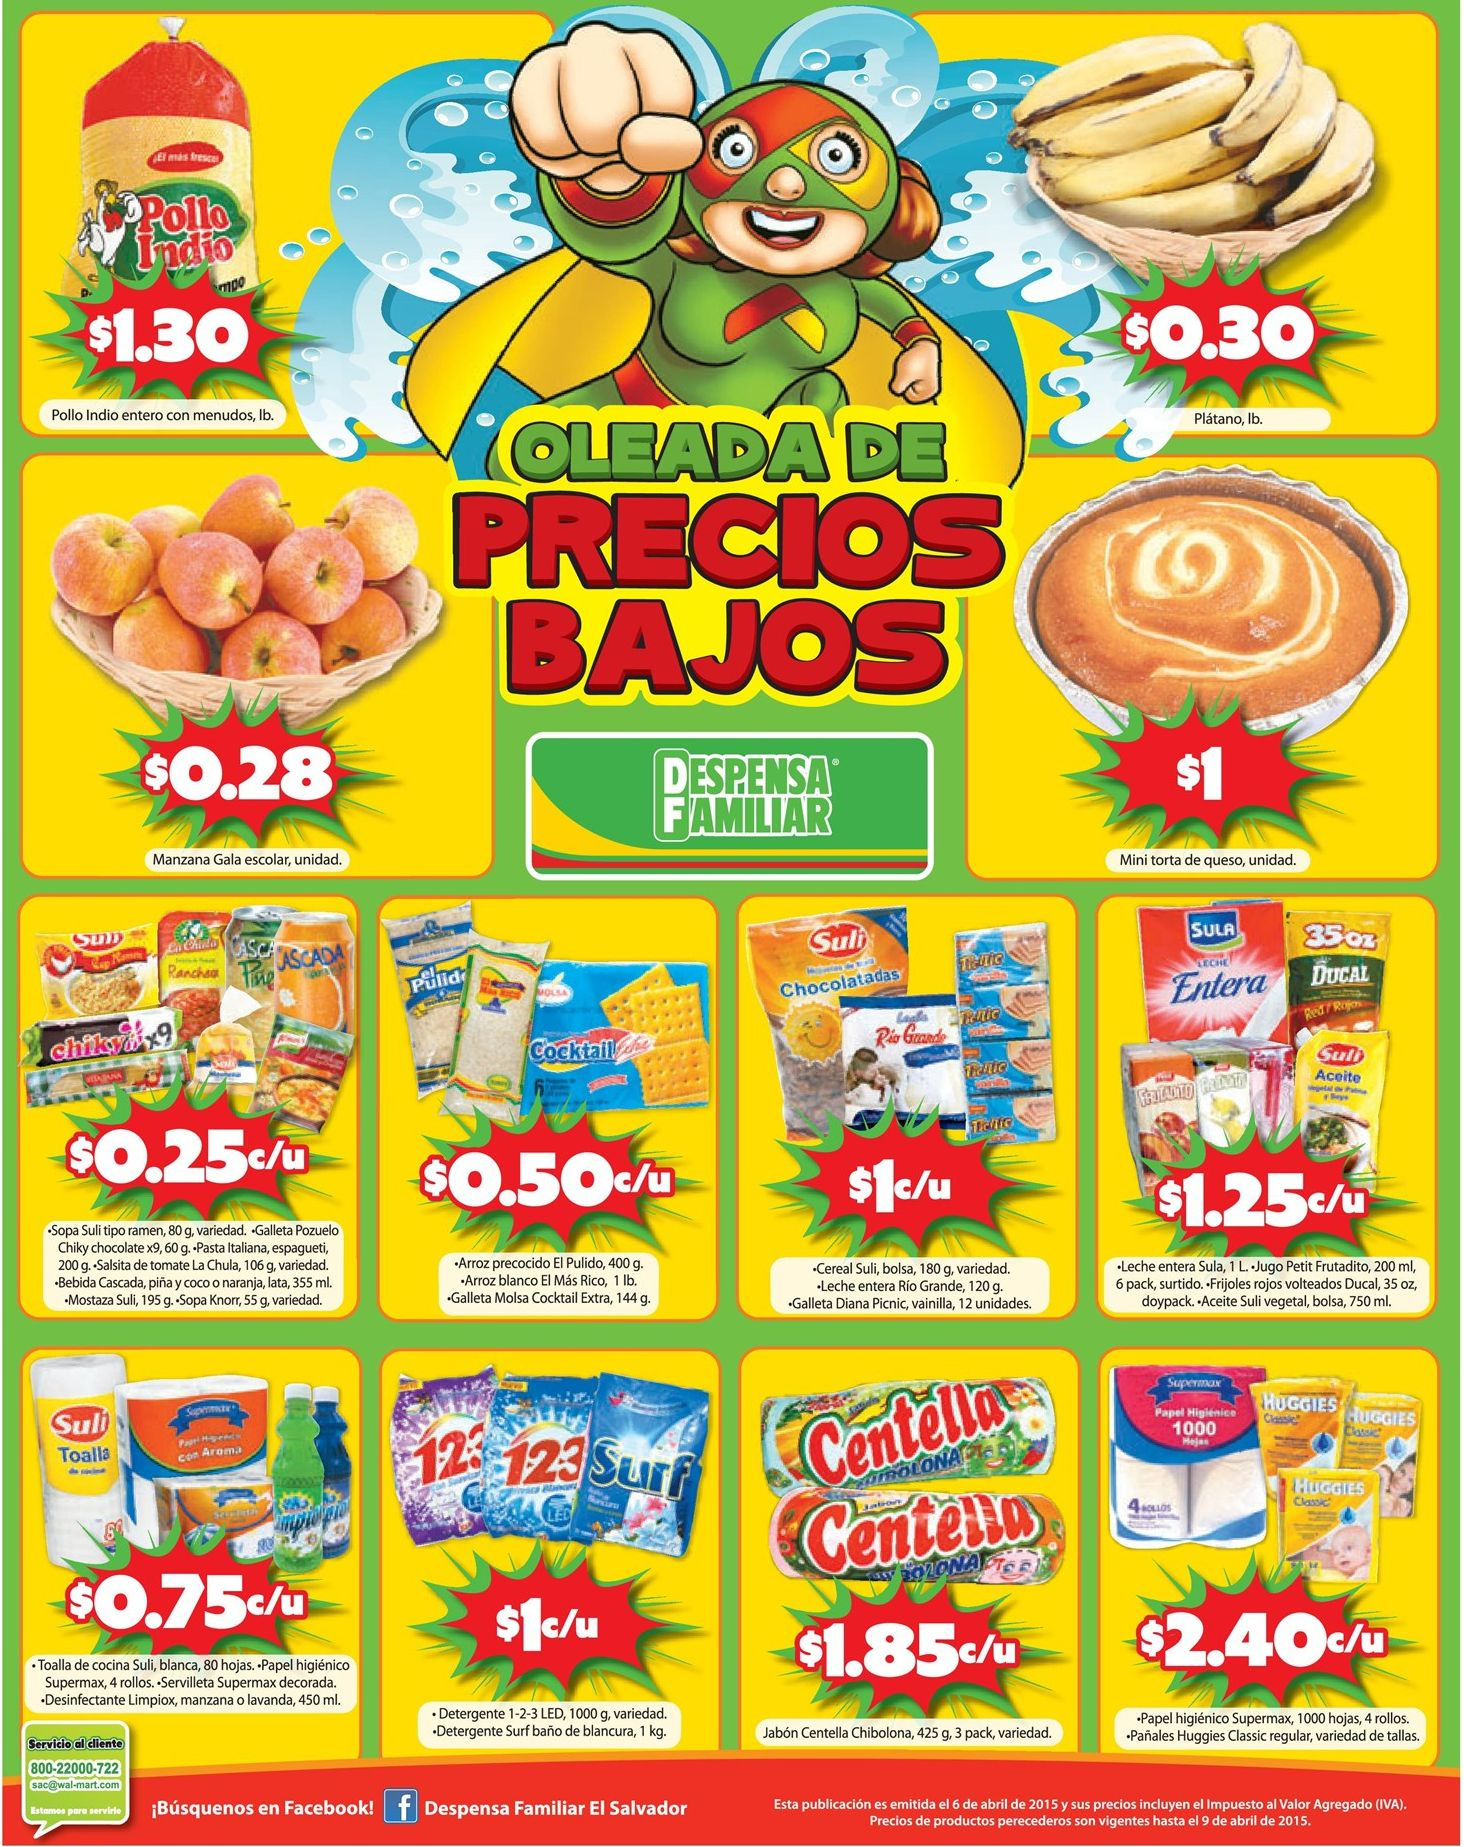 Despensa familiar ofertas de hoy - 06abr15